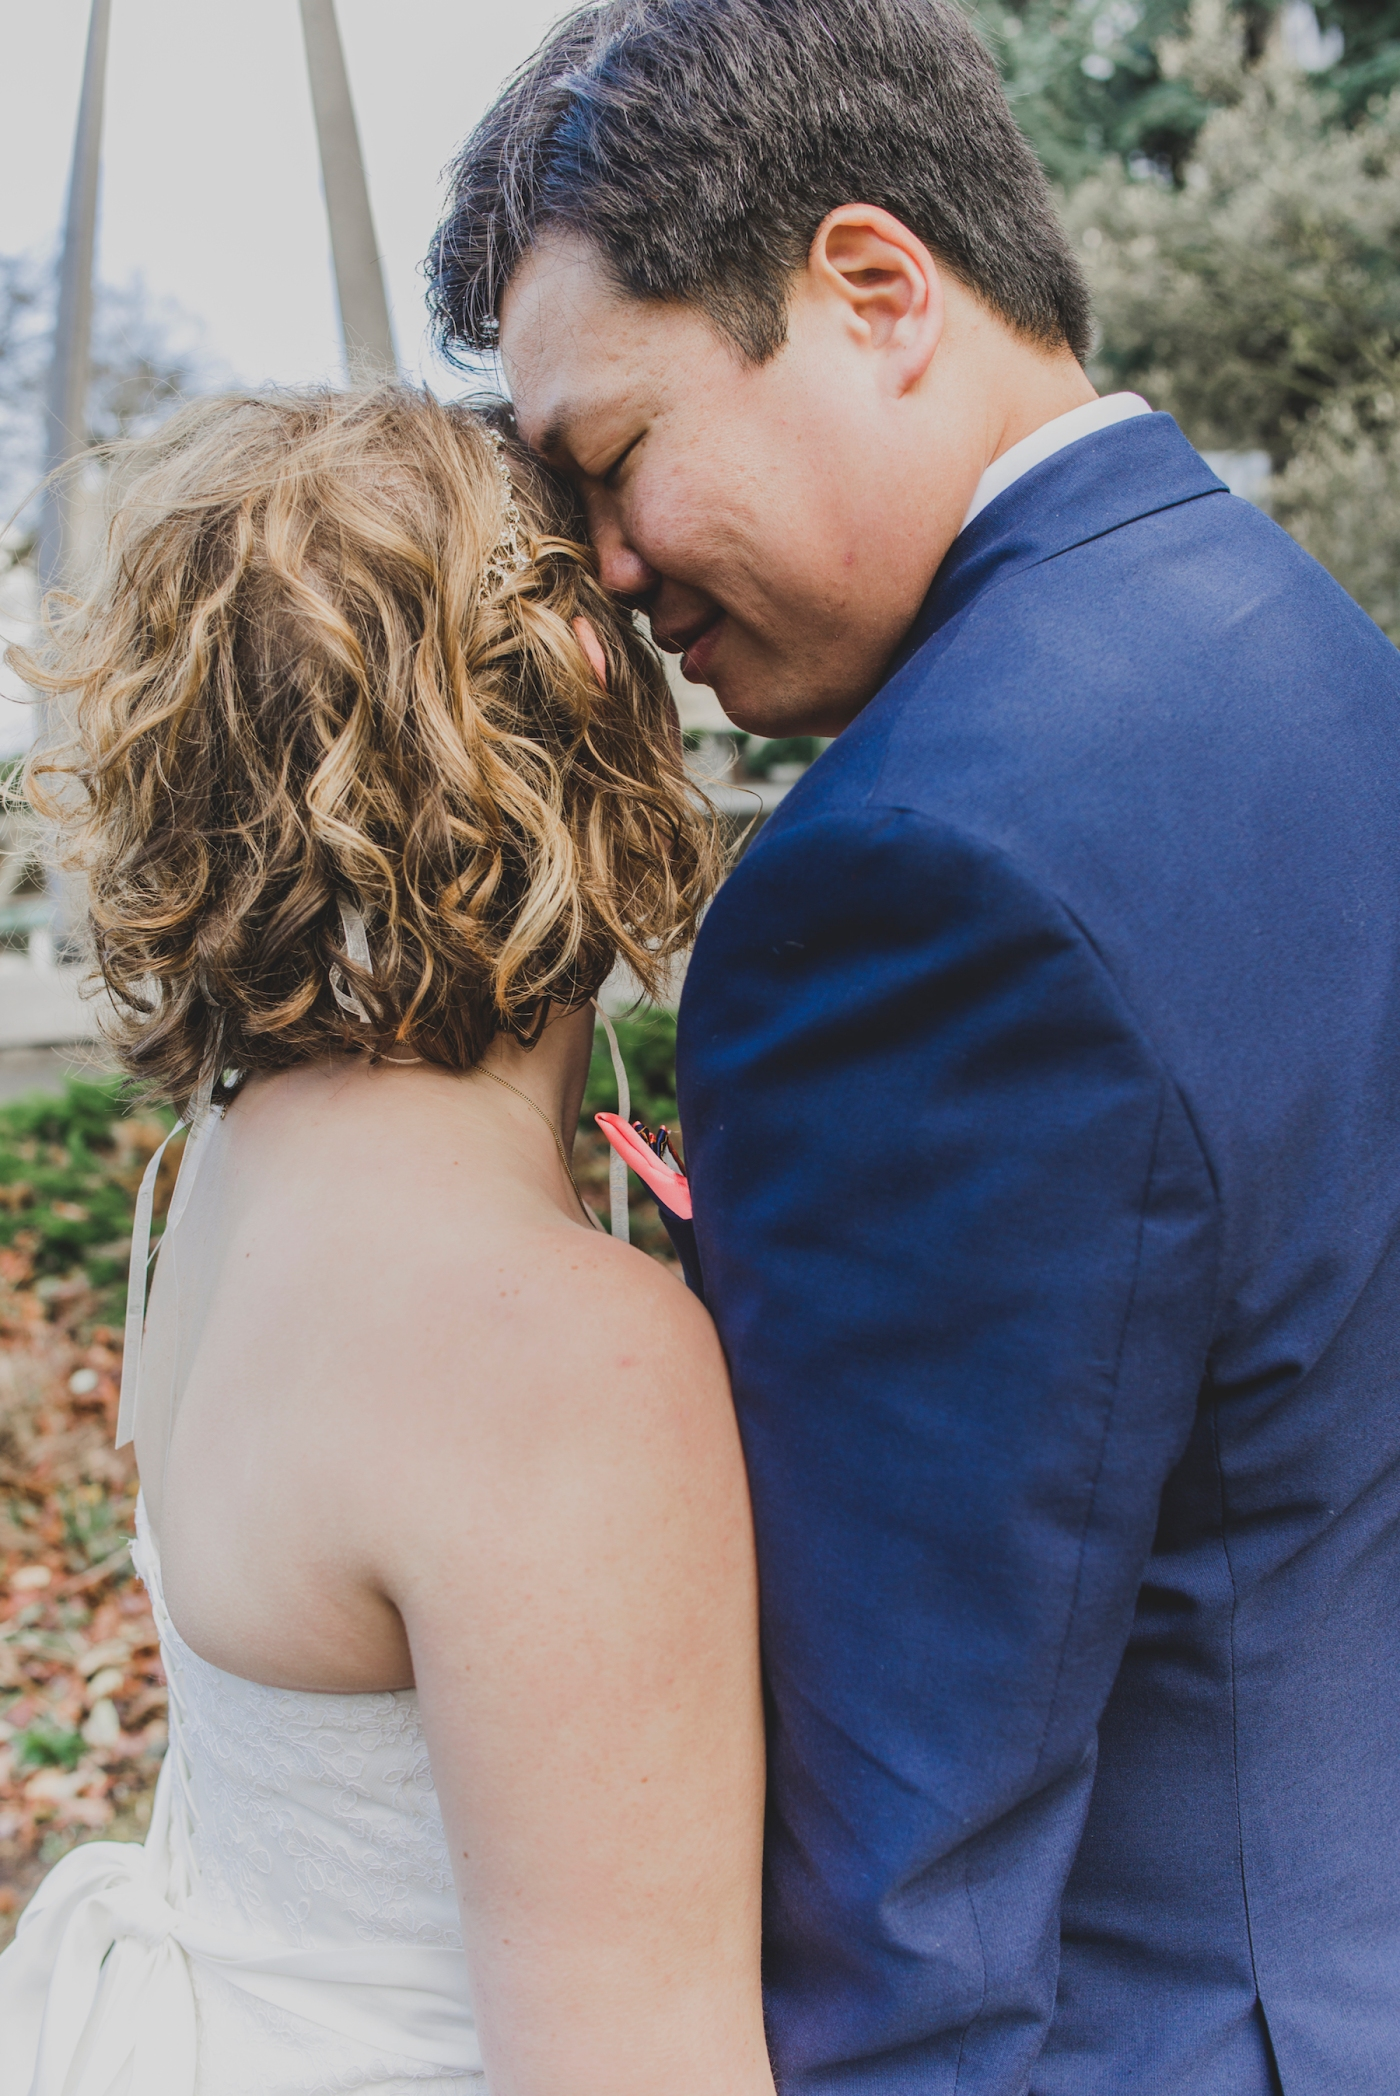 DSC_2338Everett_Wedding_Ballroom_Jane_Speleers_photography_Rachel_and_Edmund_Bridesmaids_peach_dresses_groomsmen_2017